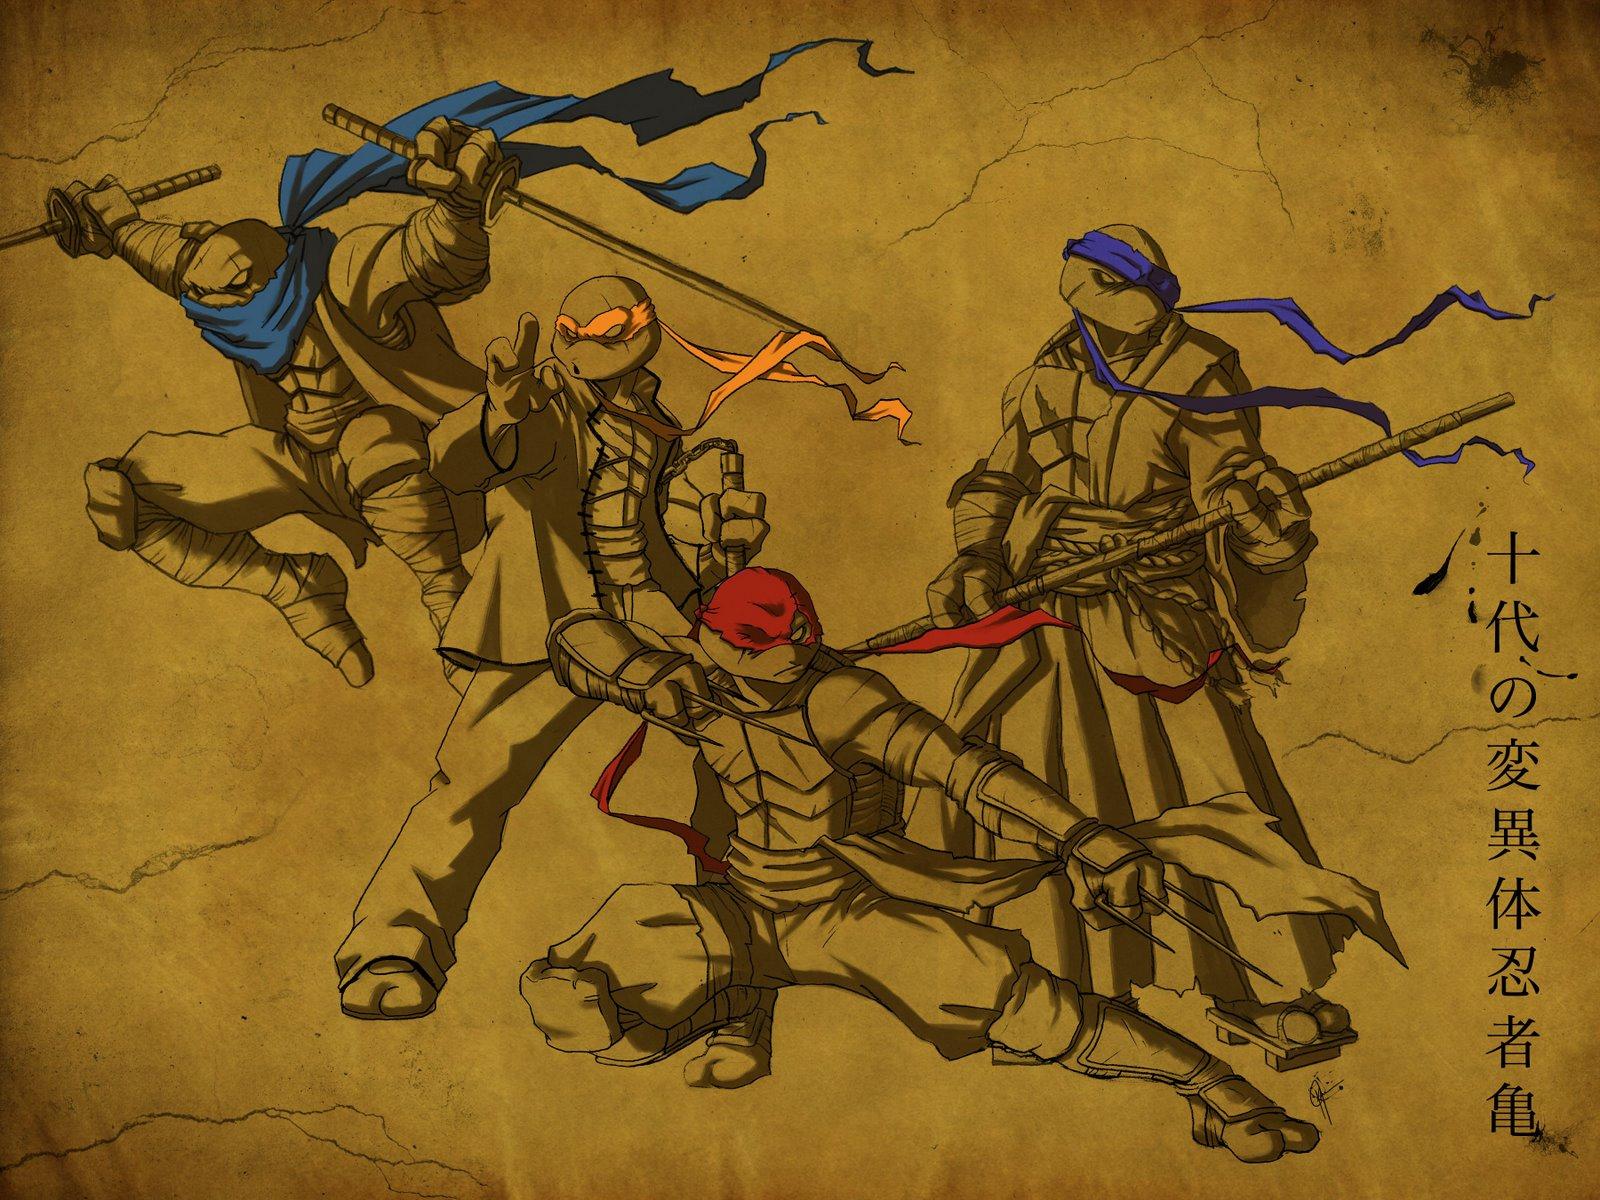 Teenage mutant ninja turtles comic wallpaper - photo#42